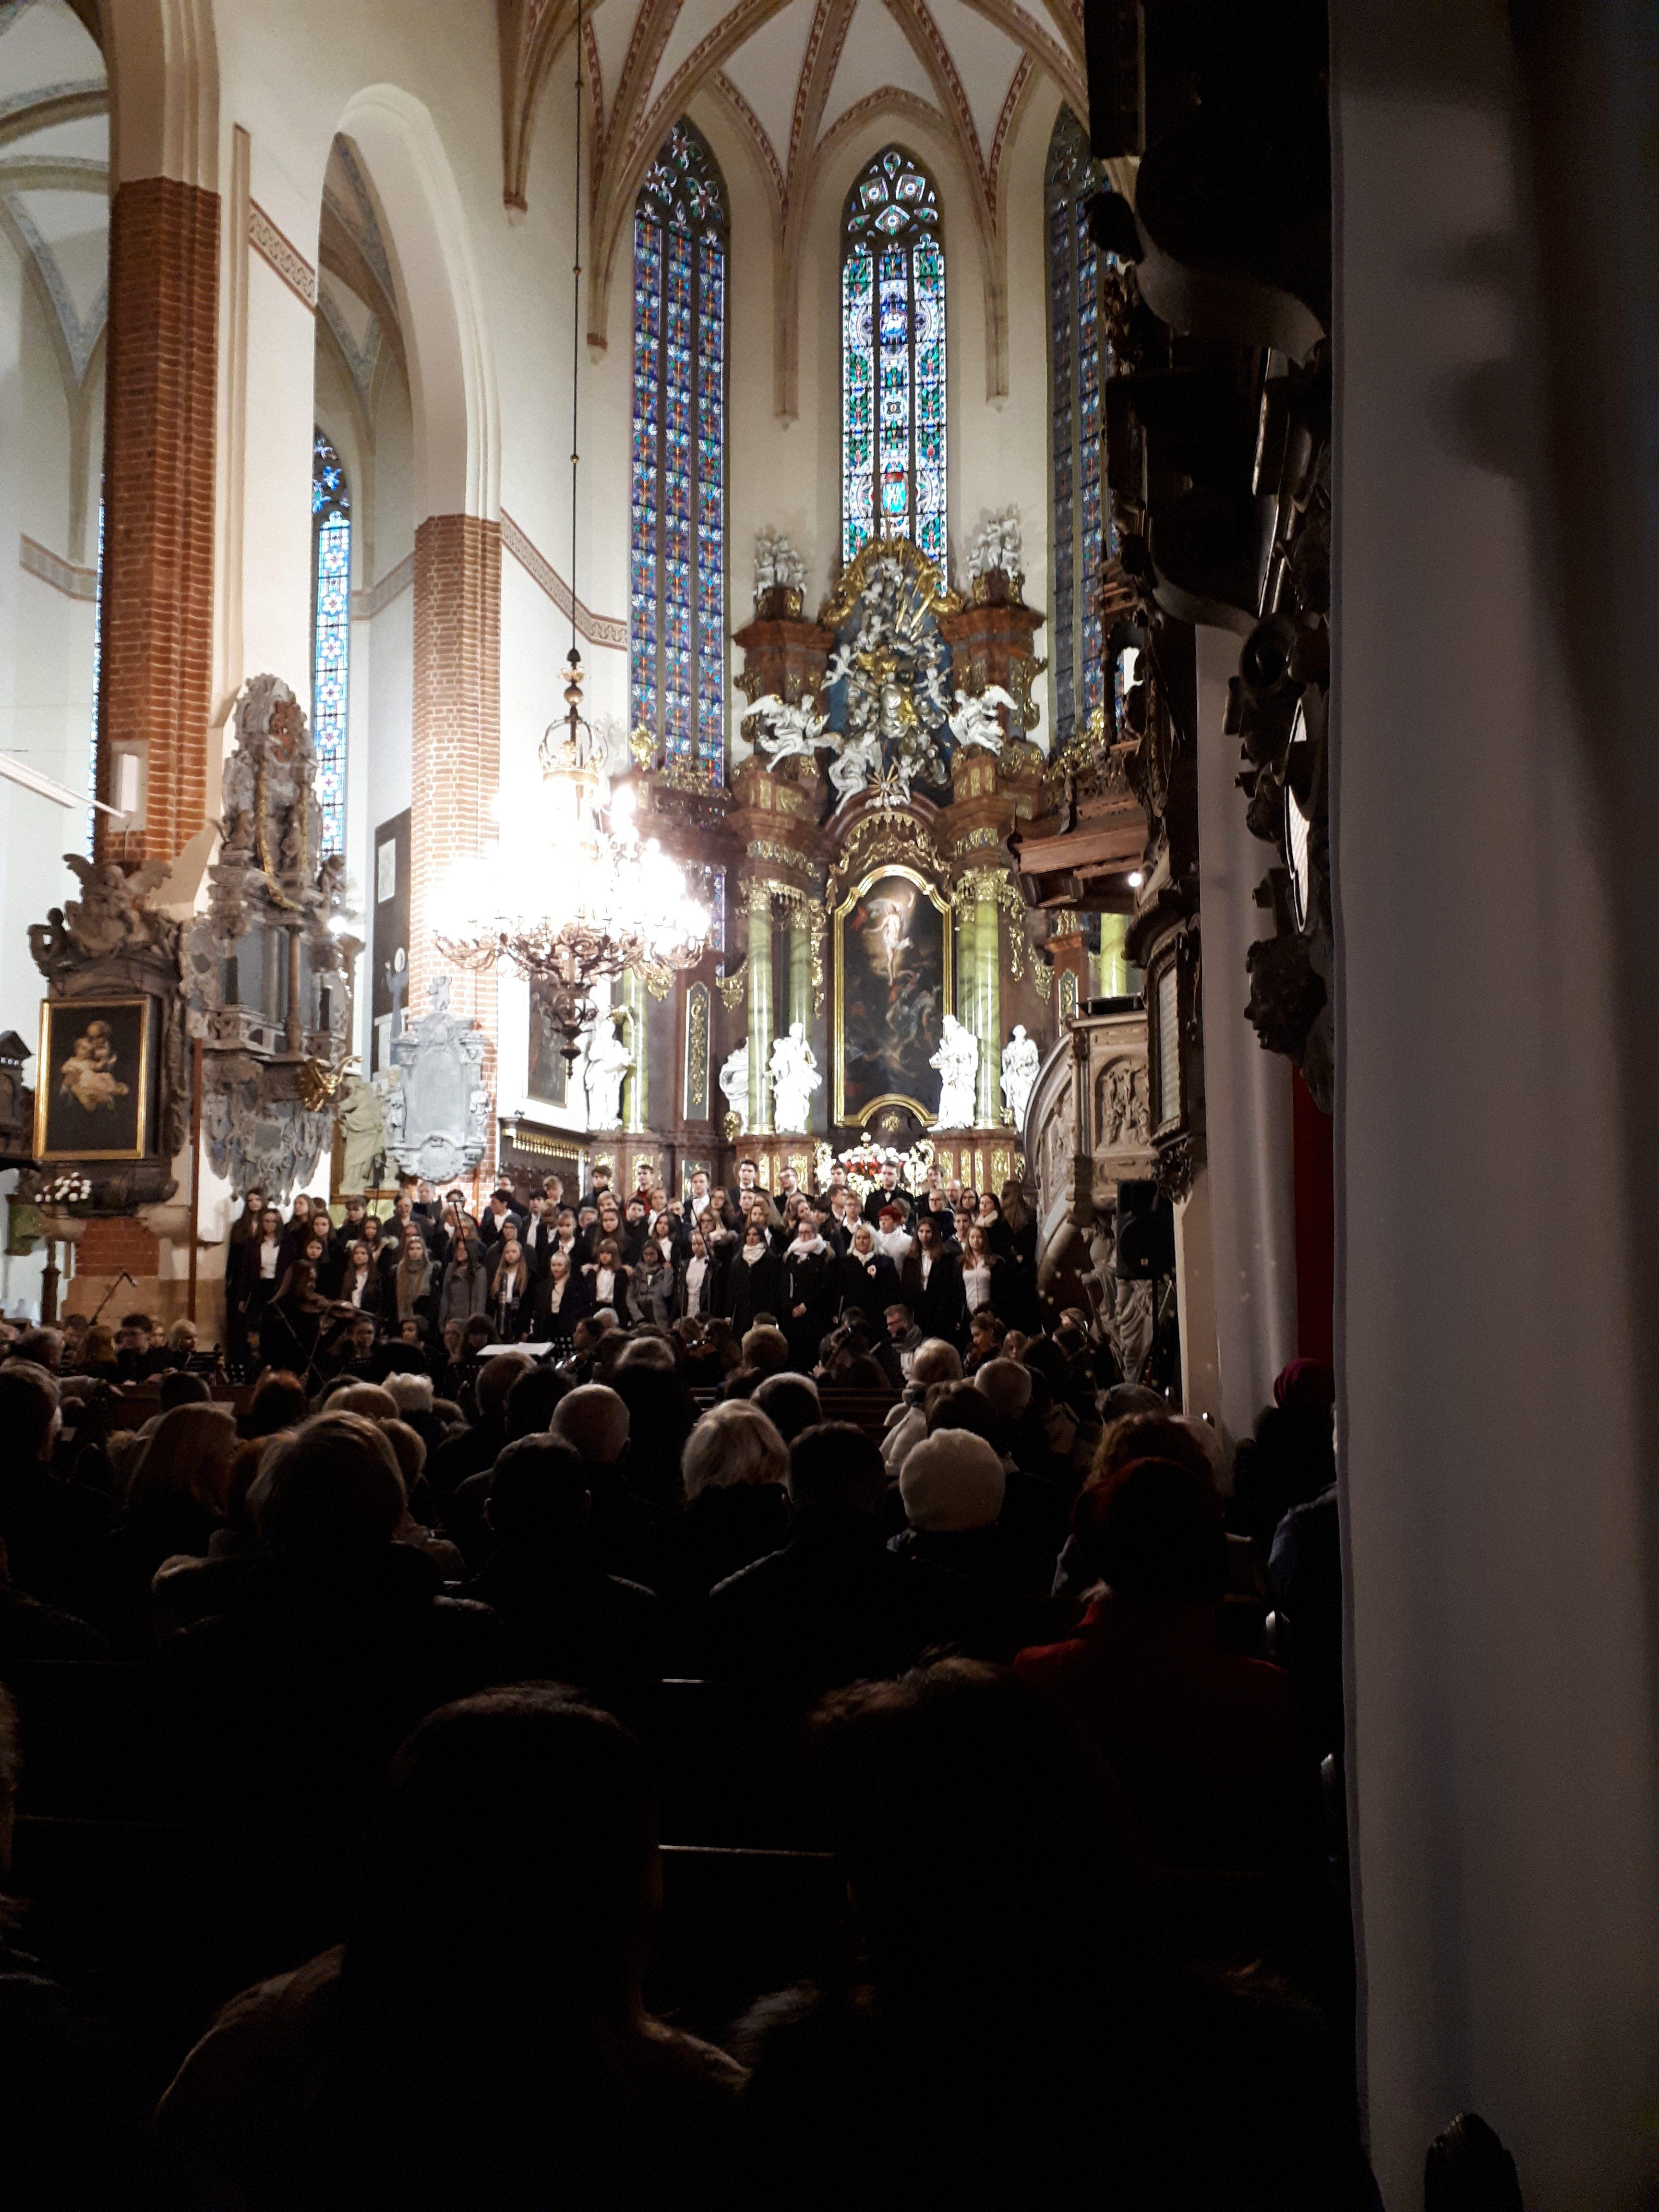 """Koncert dla Niepodległej"". Katedra Legnicka, 17.11.2018. Fot. Kamila Łapicka"